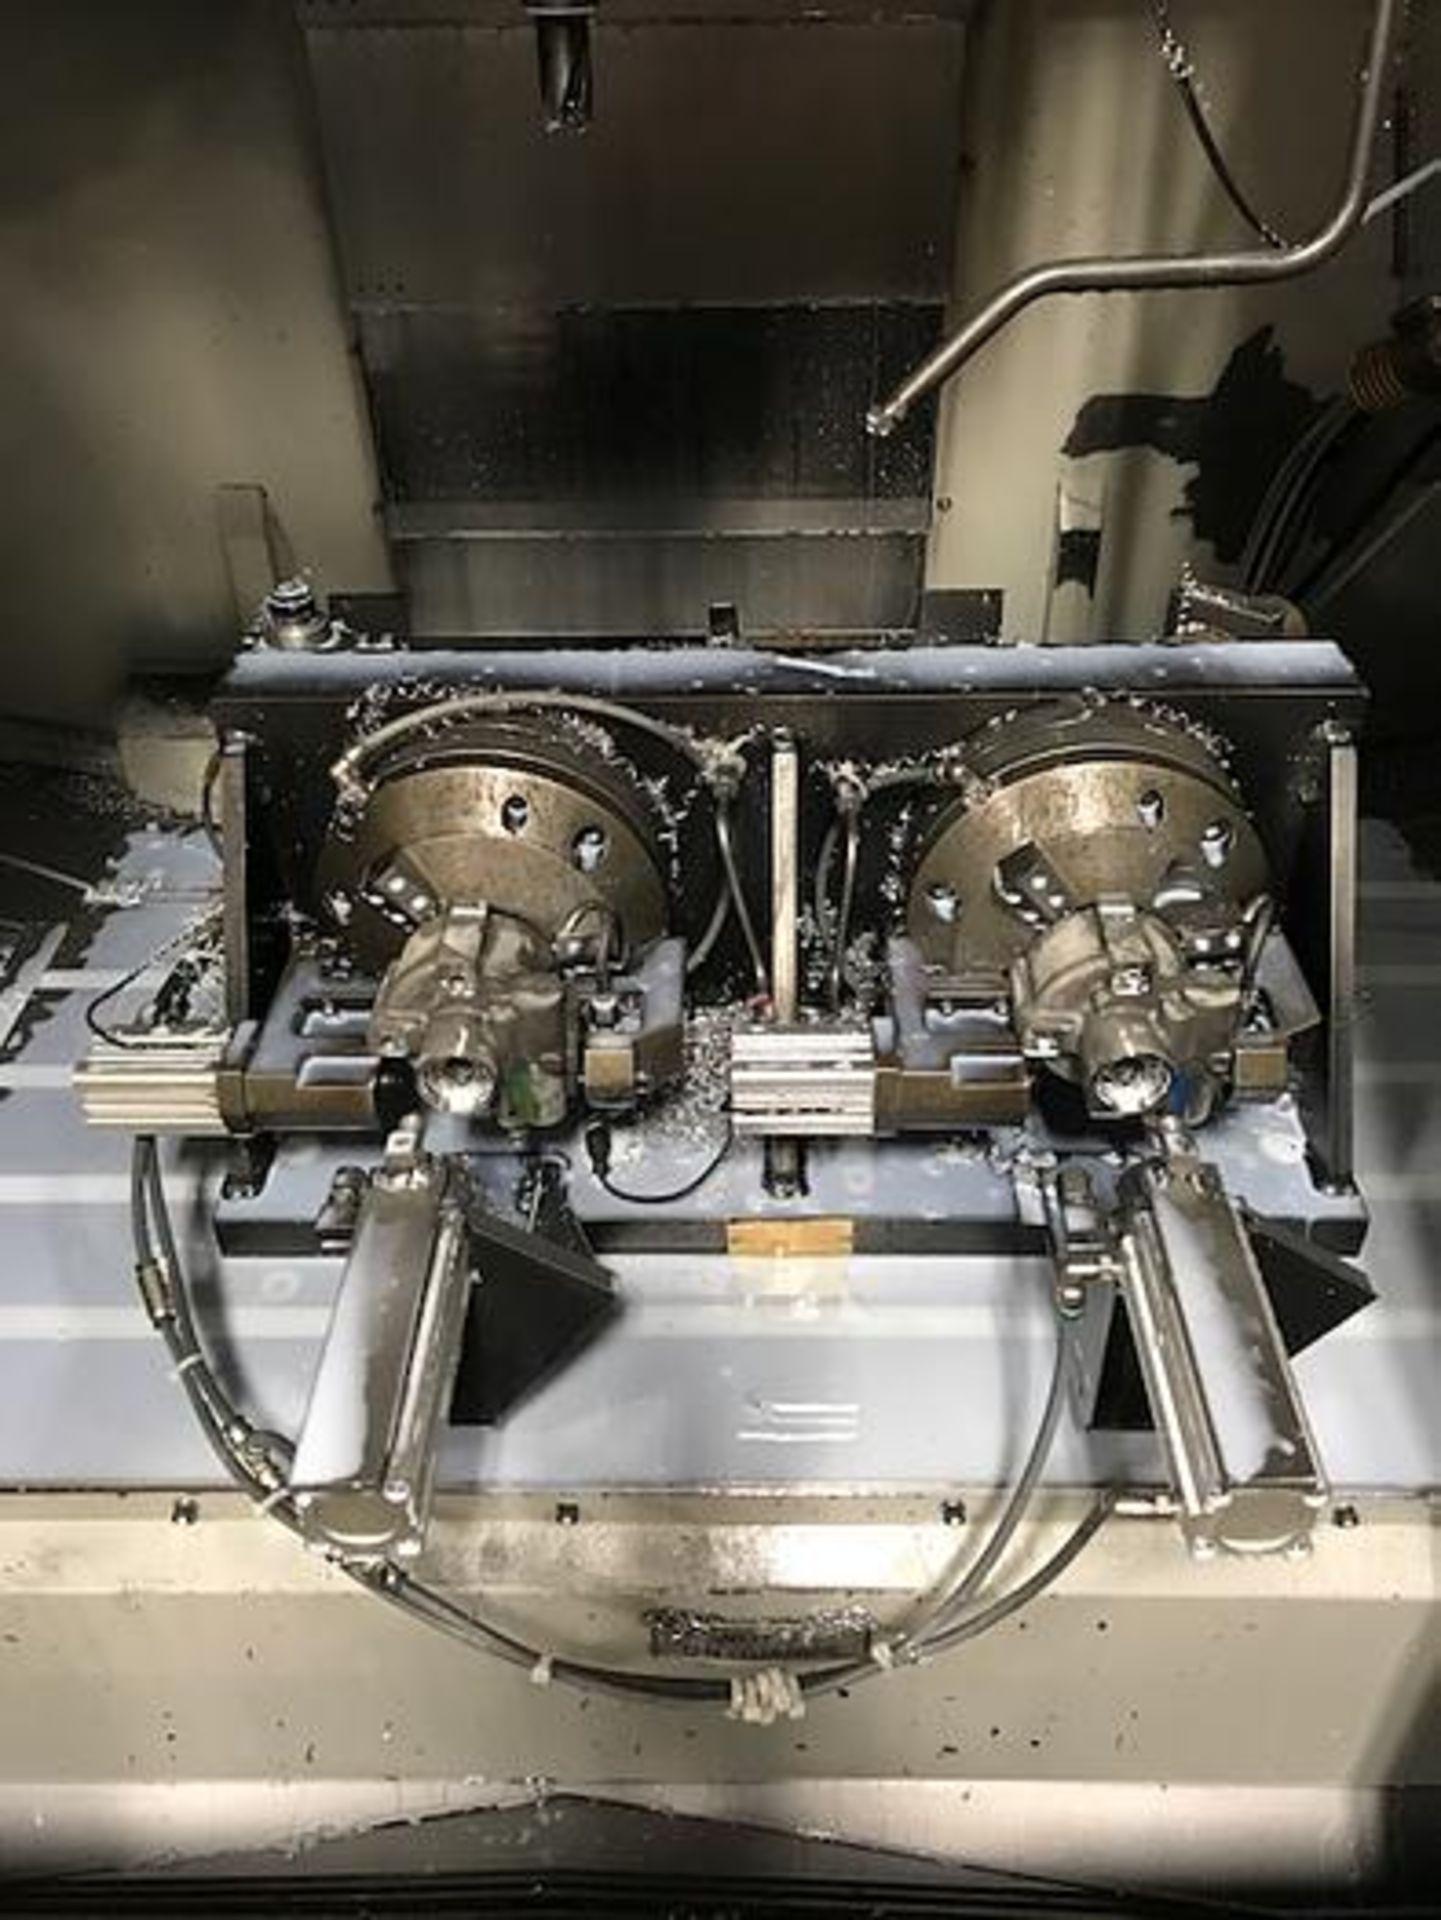 "HARDINGE XR760 CNC VMC PRODUCTION CENTER 30""X24""X24"", YEAR 2010, SN XRAB0A0001 - Image 11 of 12"